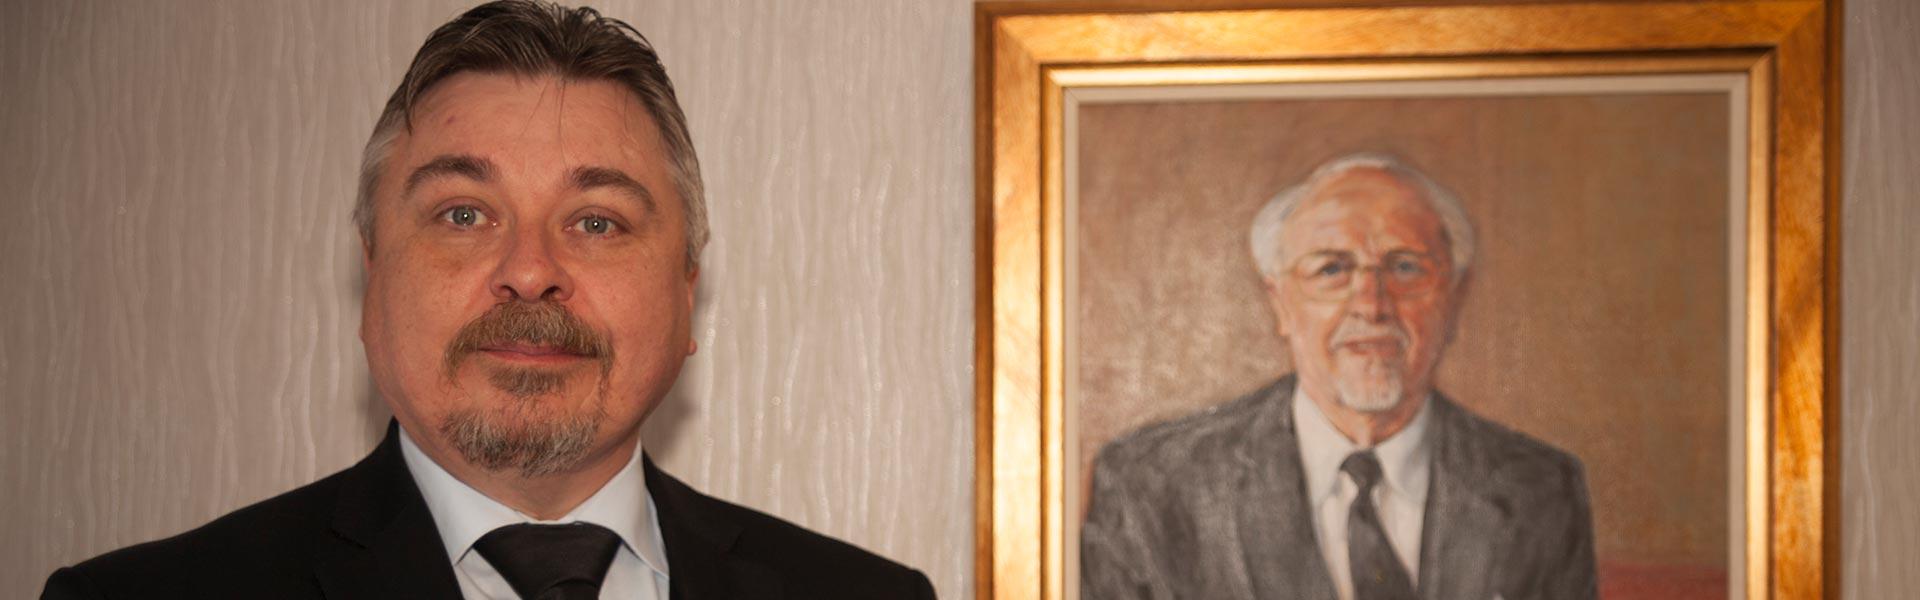 John Gauld - Funeral Director